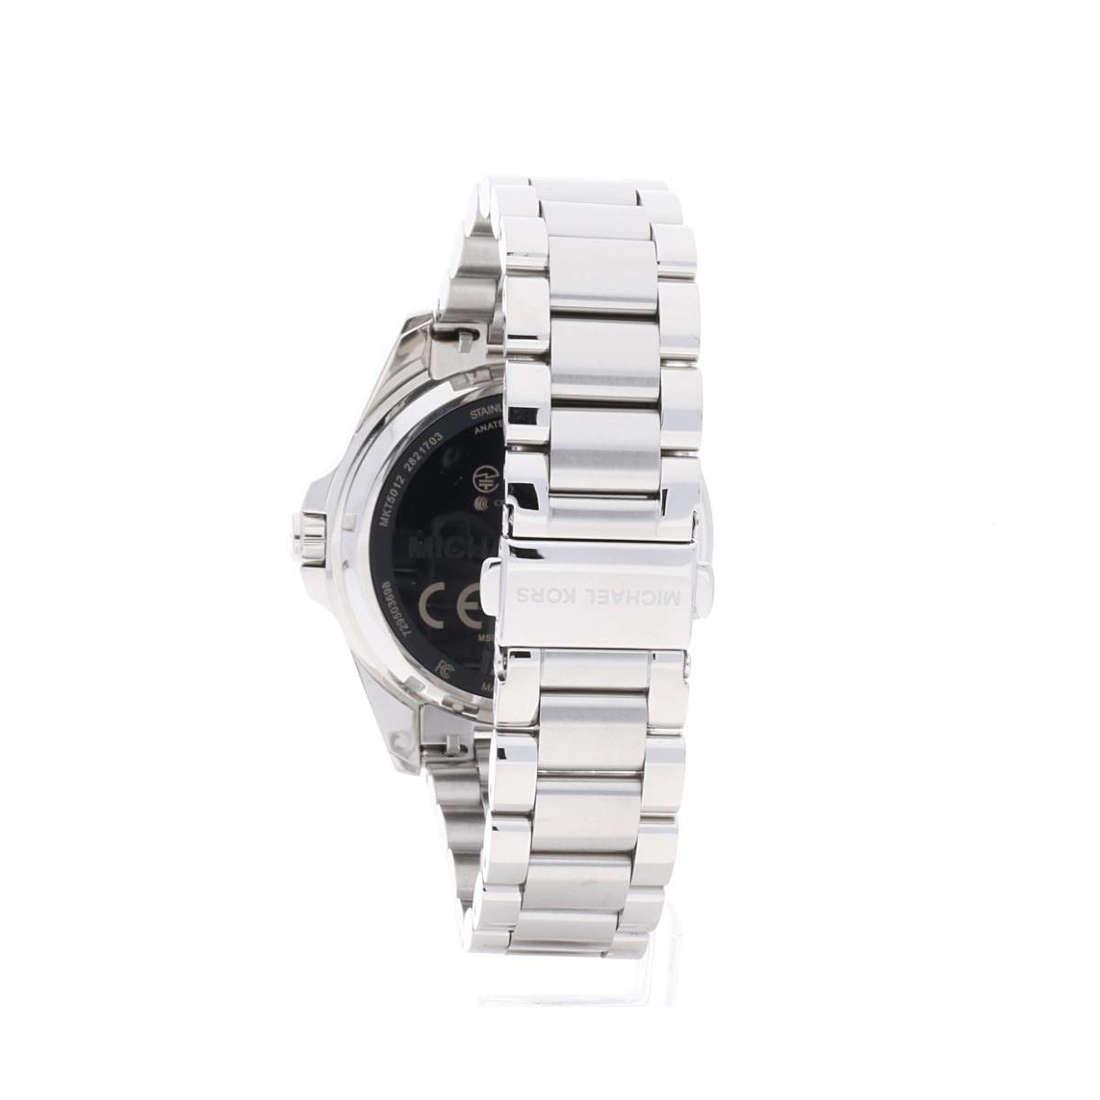 nouvelles montres femme Michael Kors MKT5012